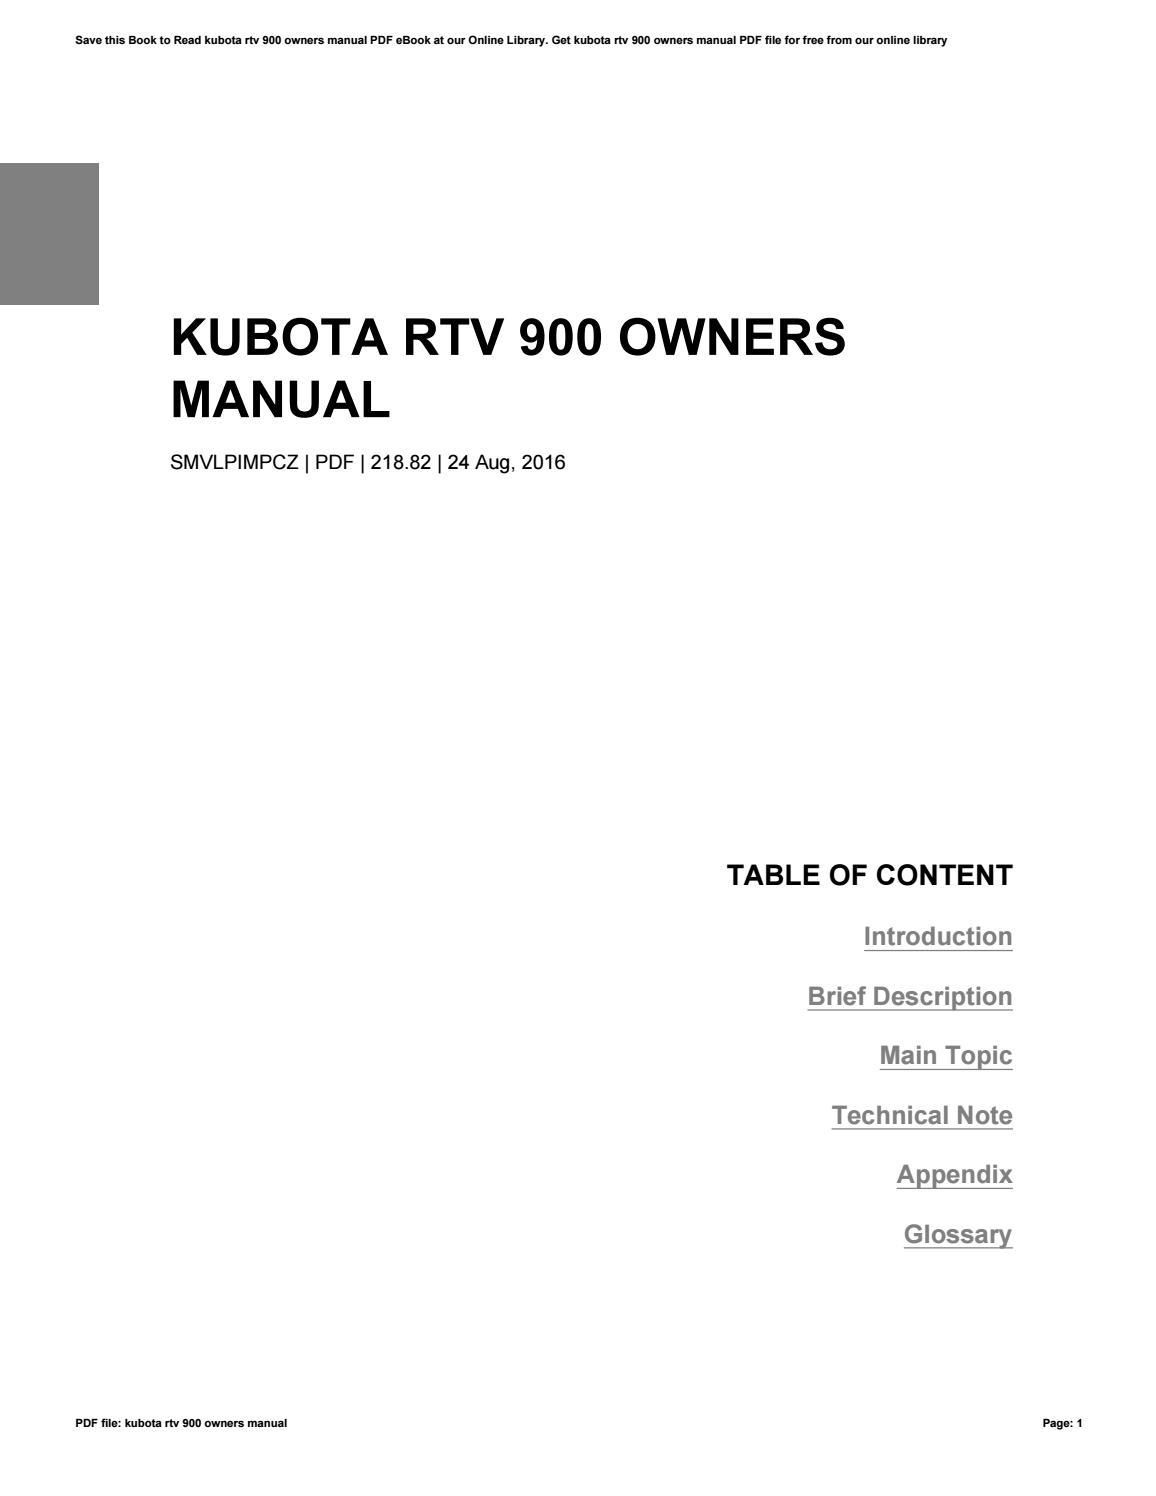 Kubota rtv900 repair manual ebook pdf download array kubota rtv 900 owners manual by marciaalt4980 issuu rh issuu fandeluxe Image collections